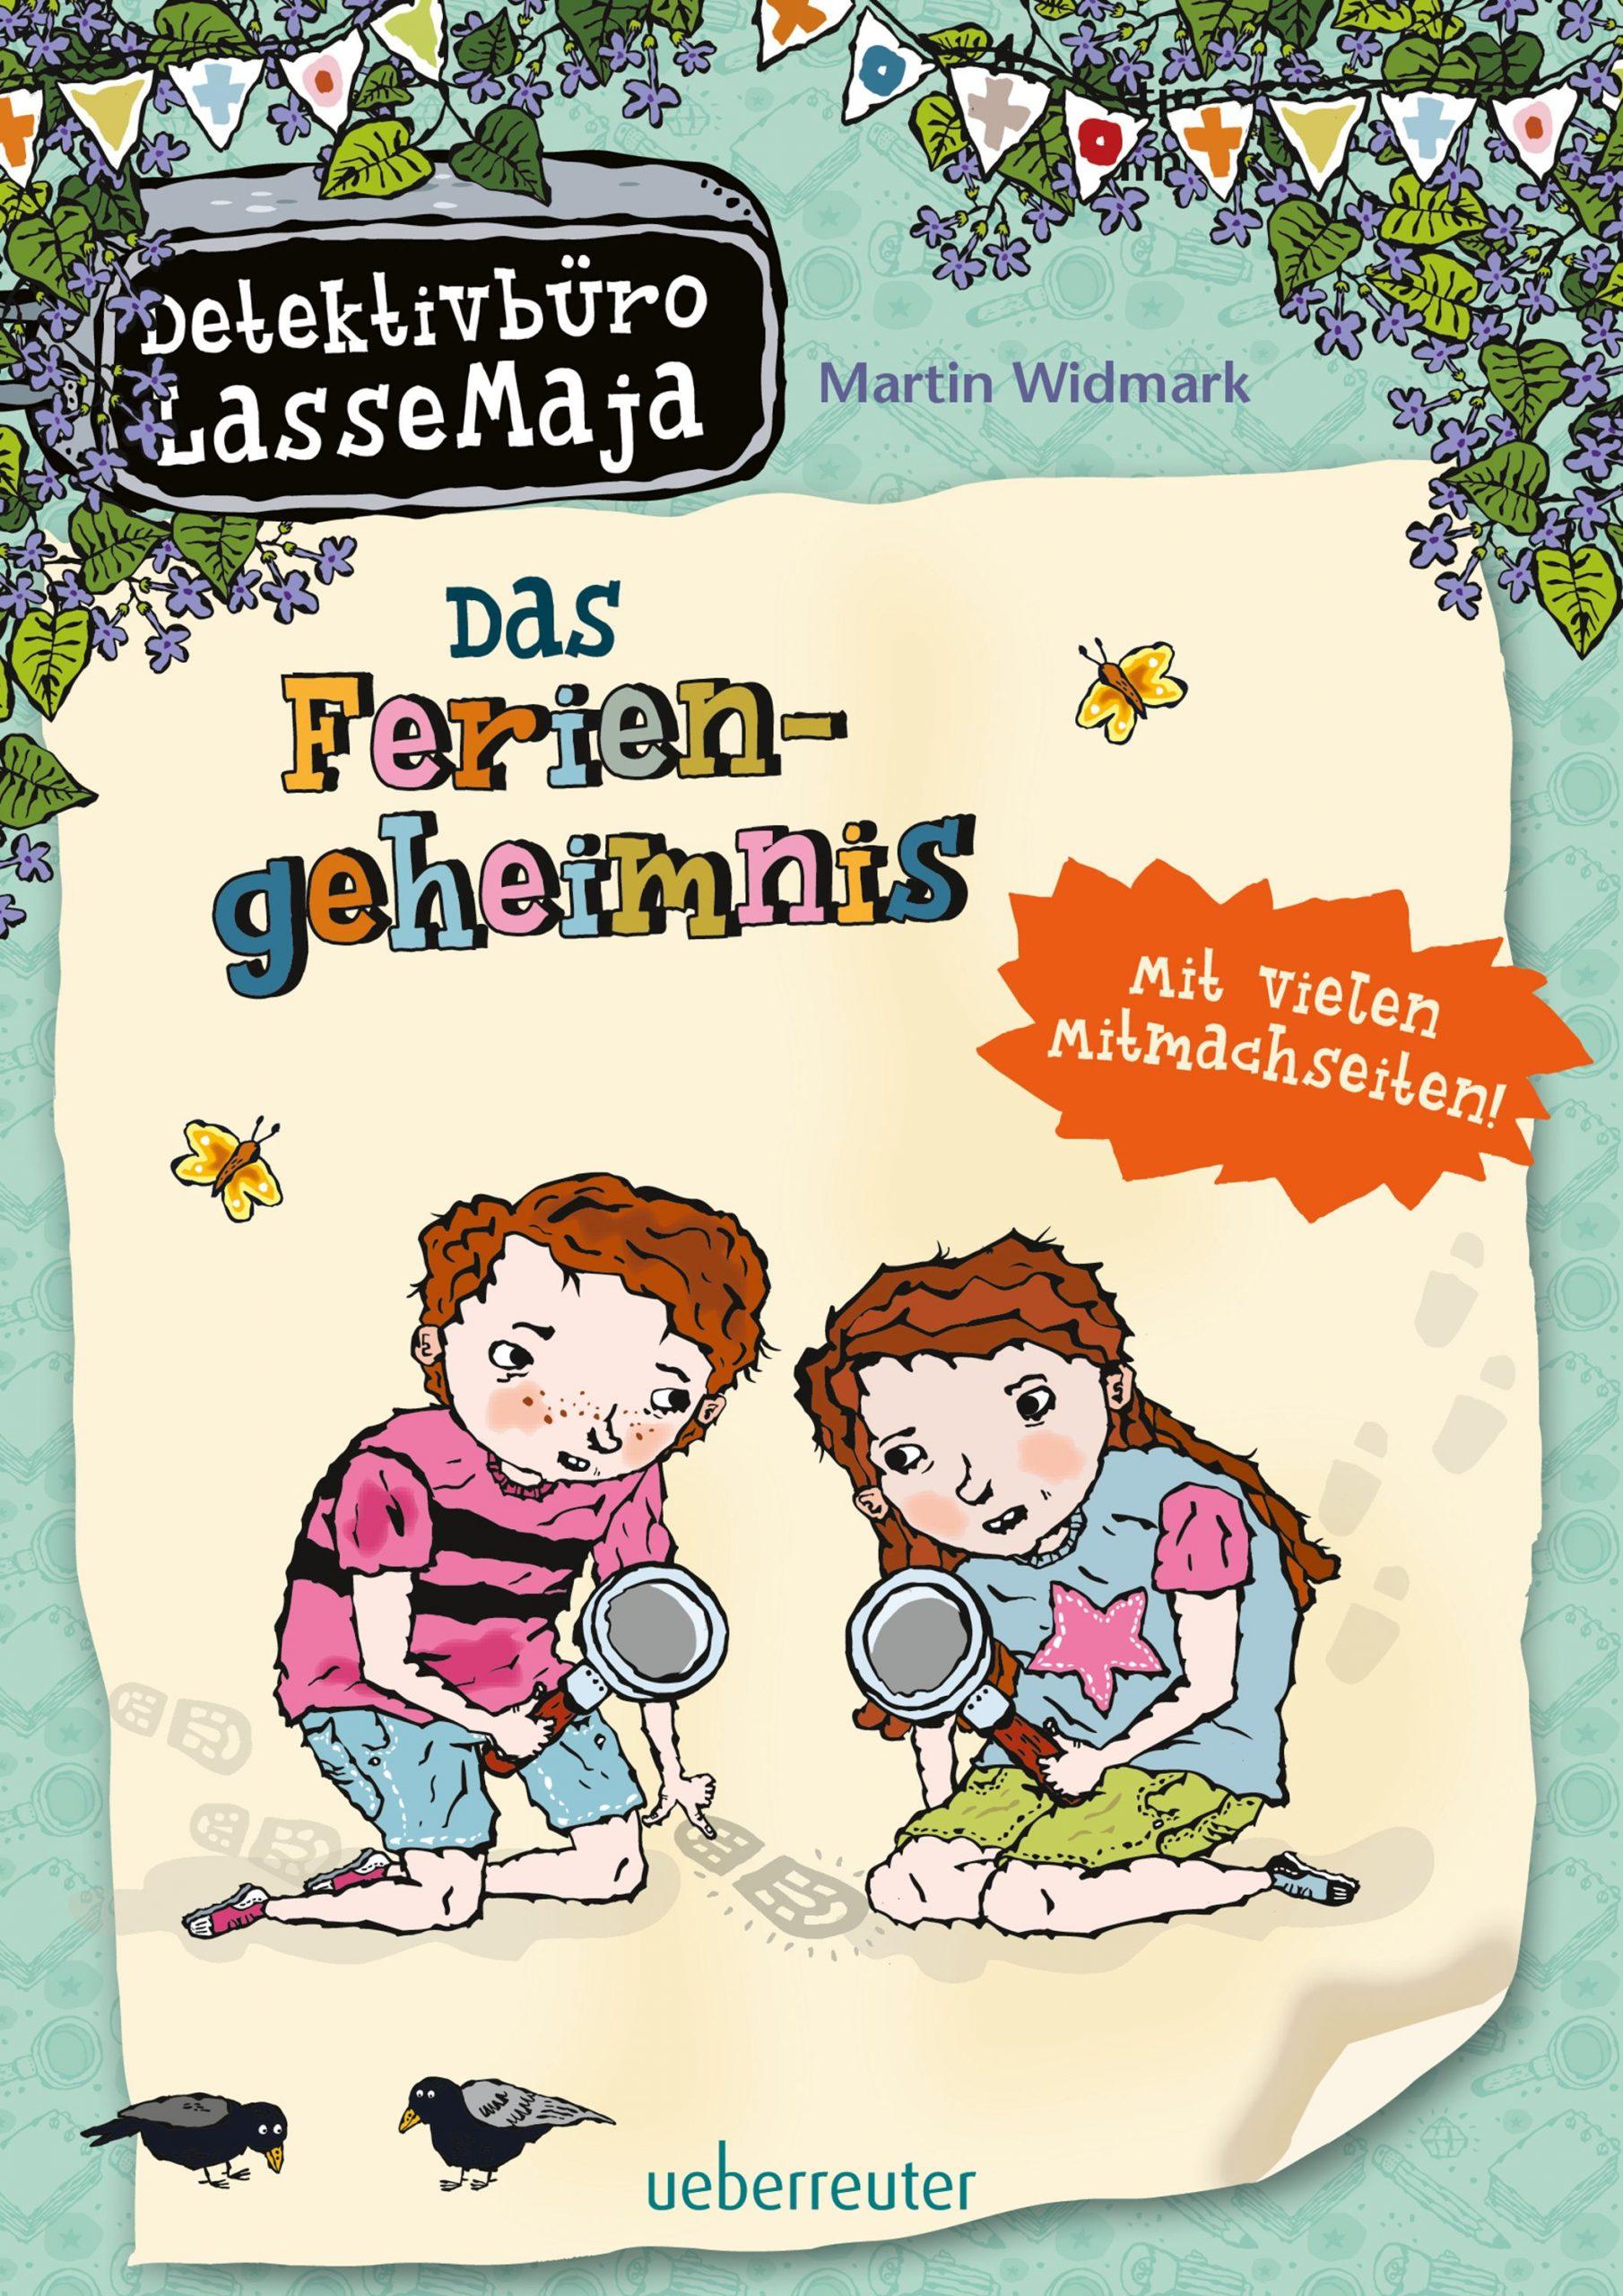 Detektivbüro LasseMaja – Das Feriengeheimnis